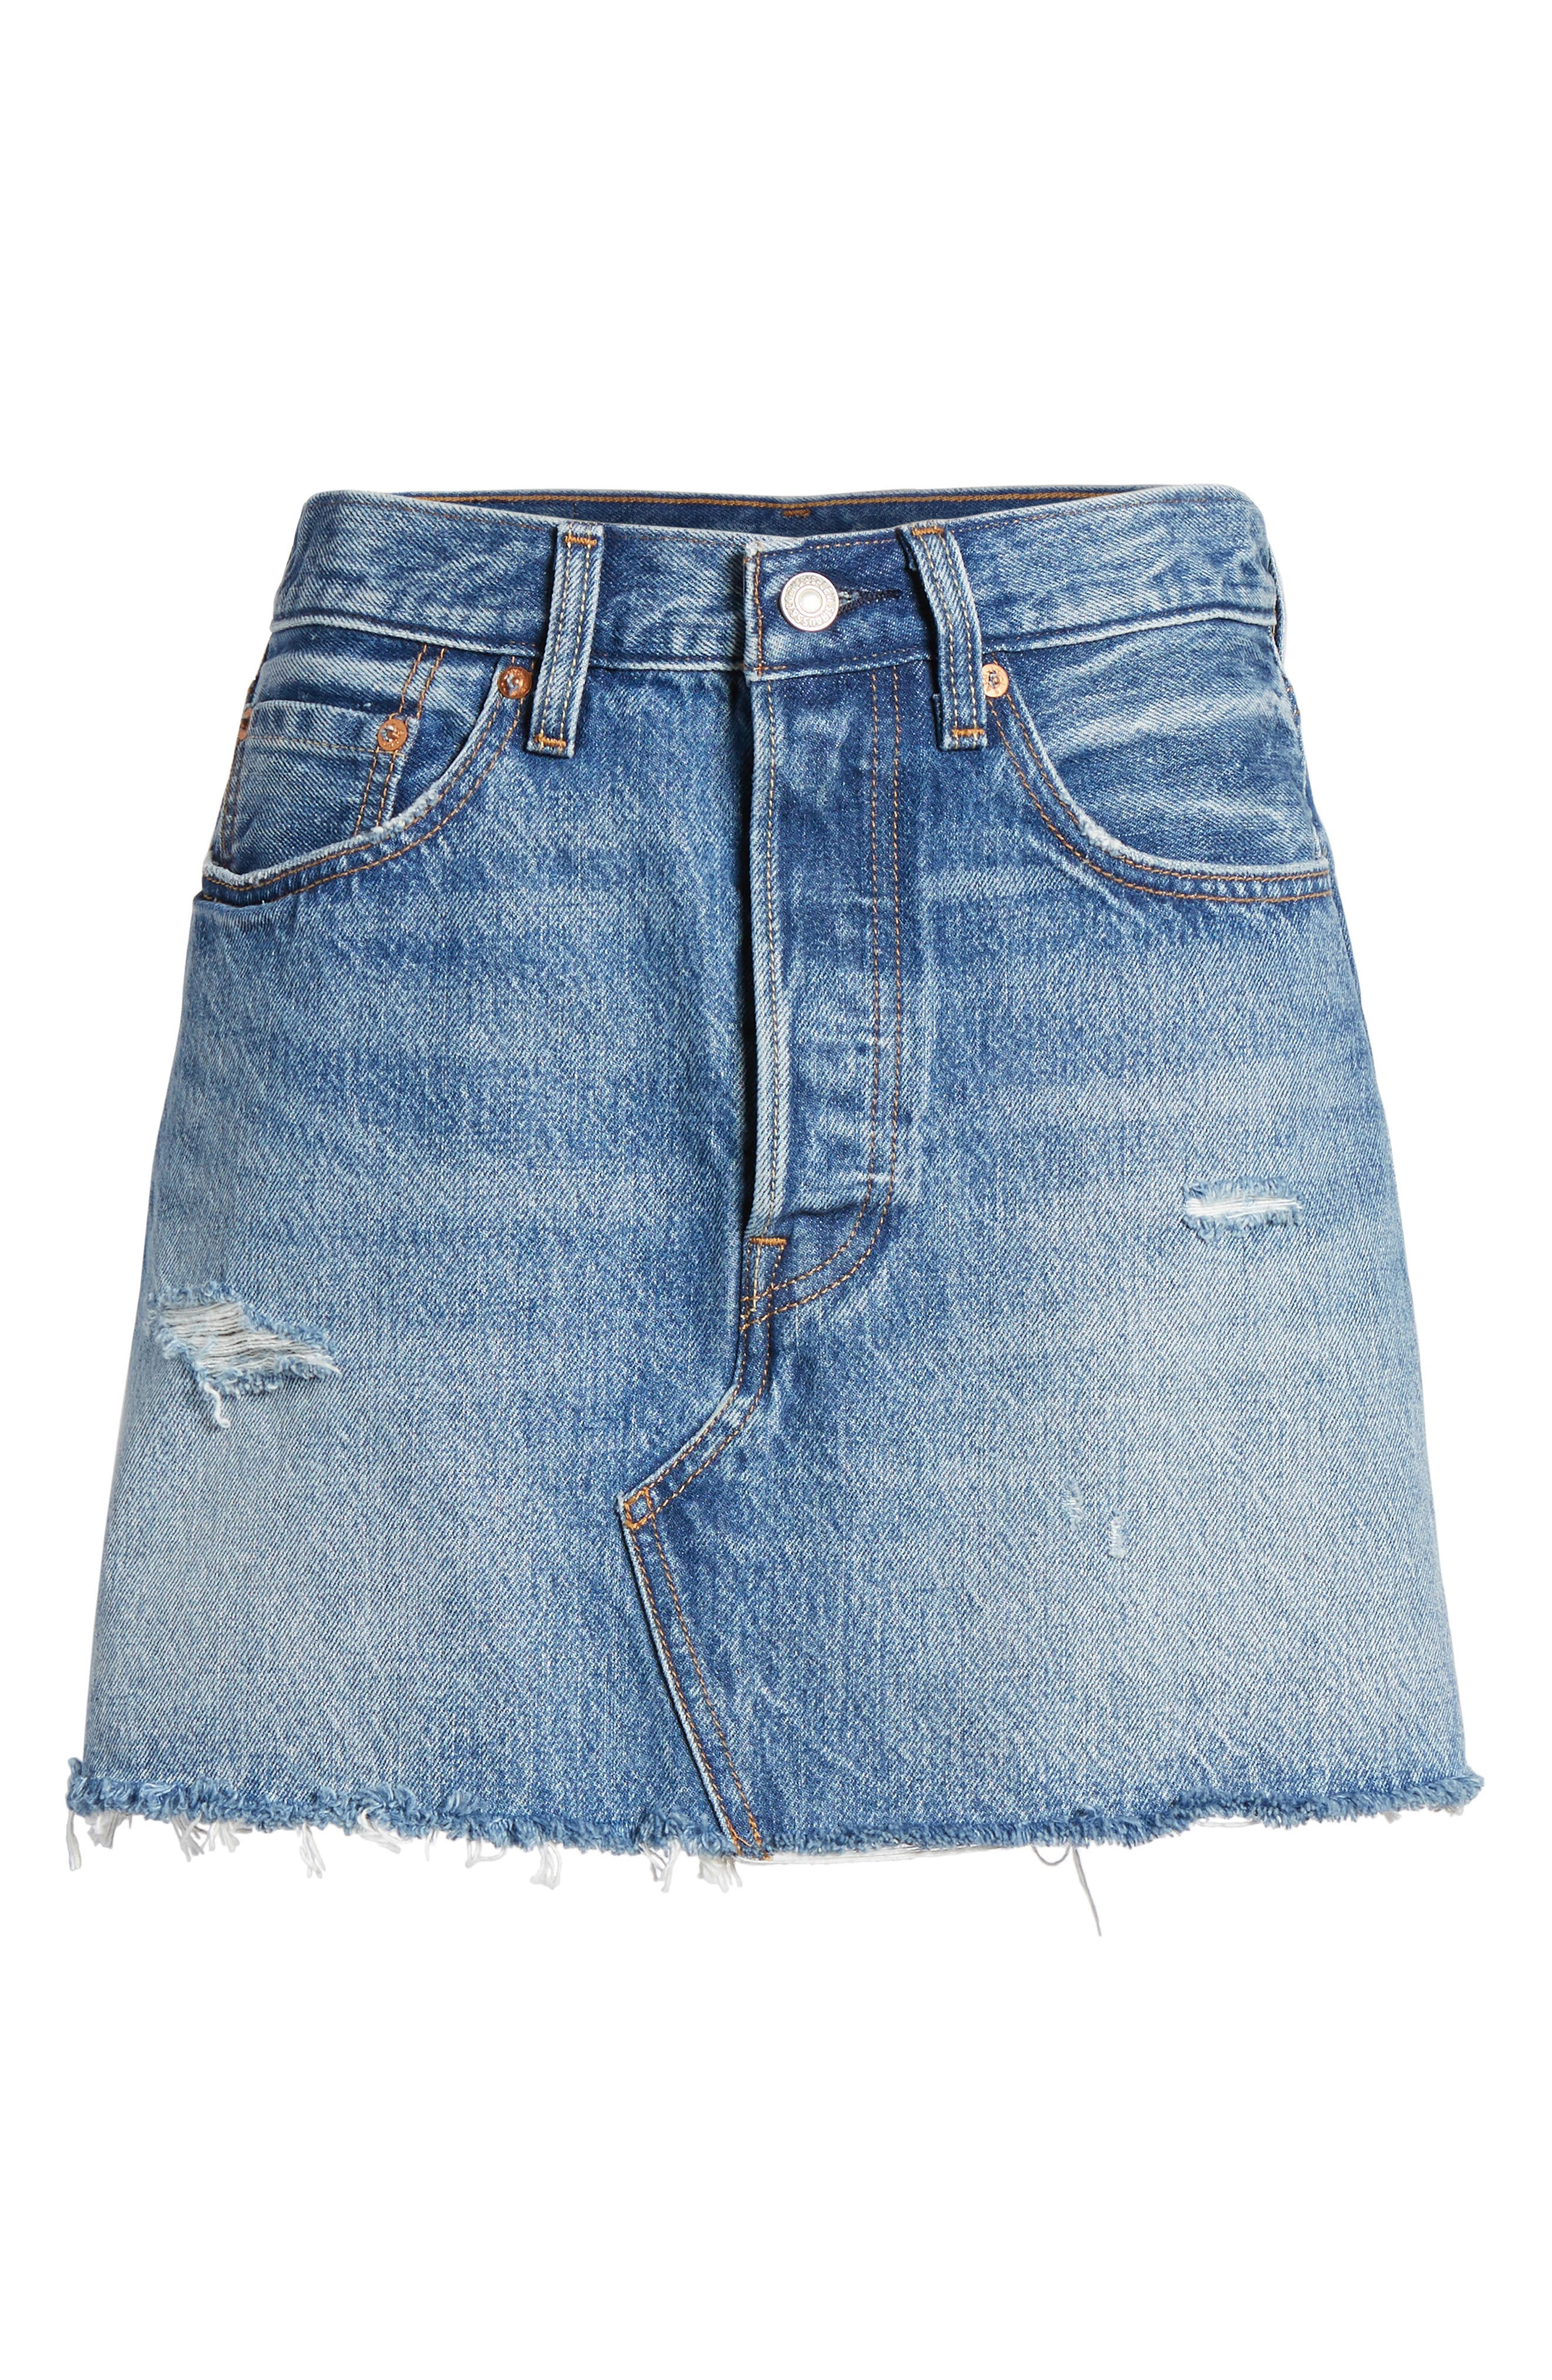 Distressed Denim Skirt,                             Alternate thumbnail 6, color,